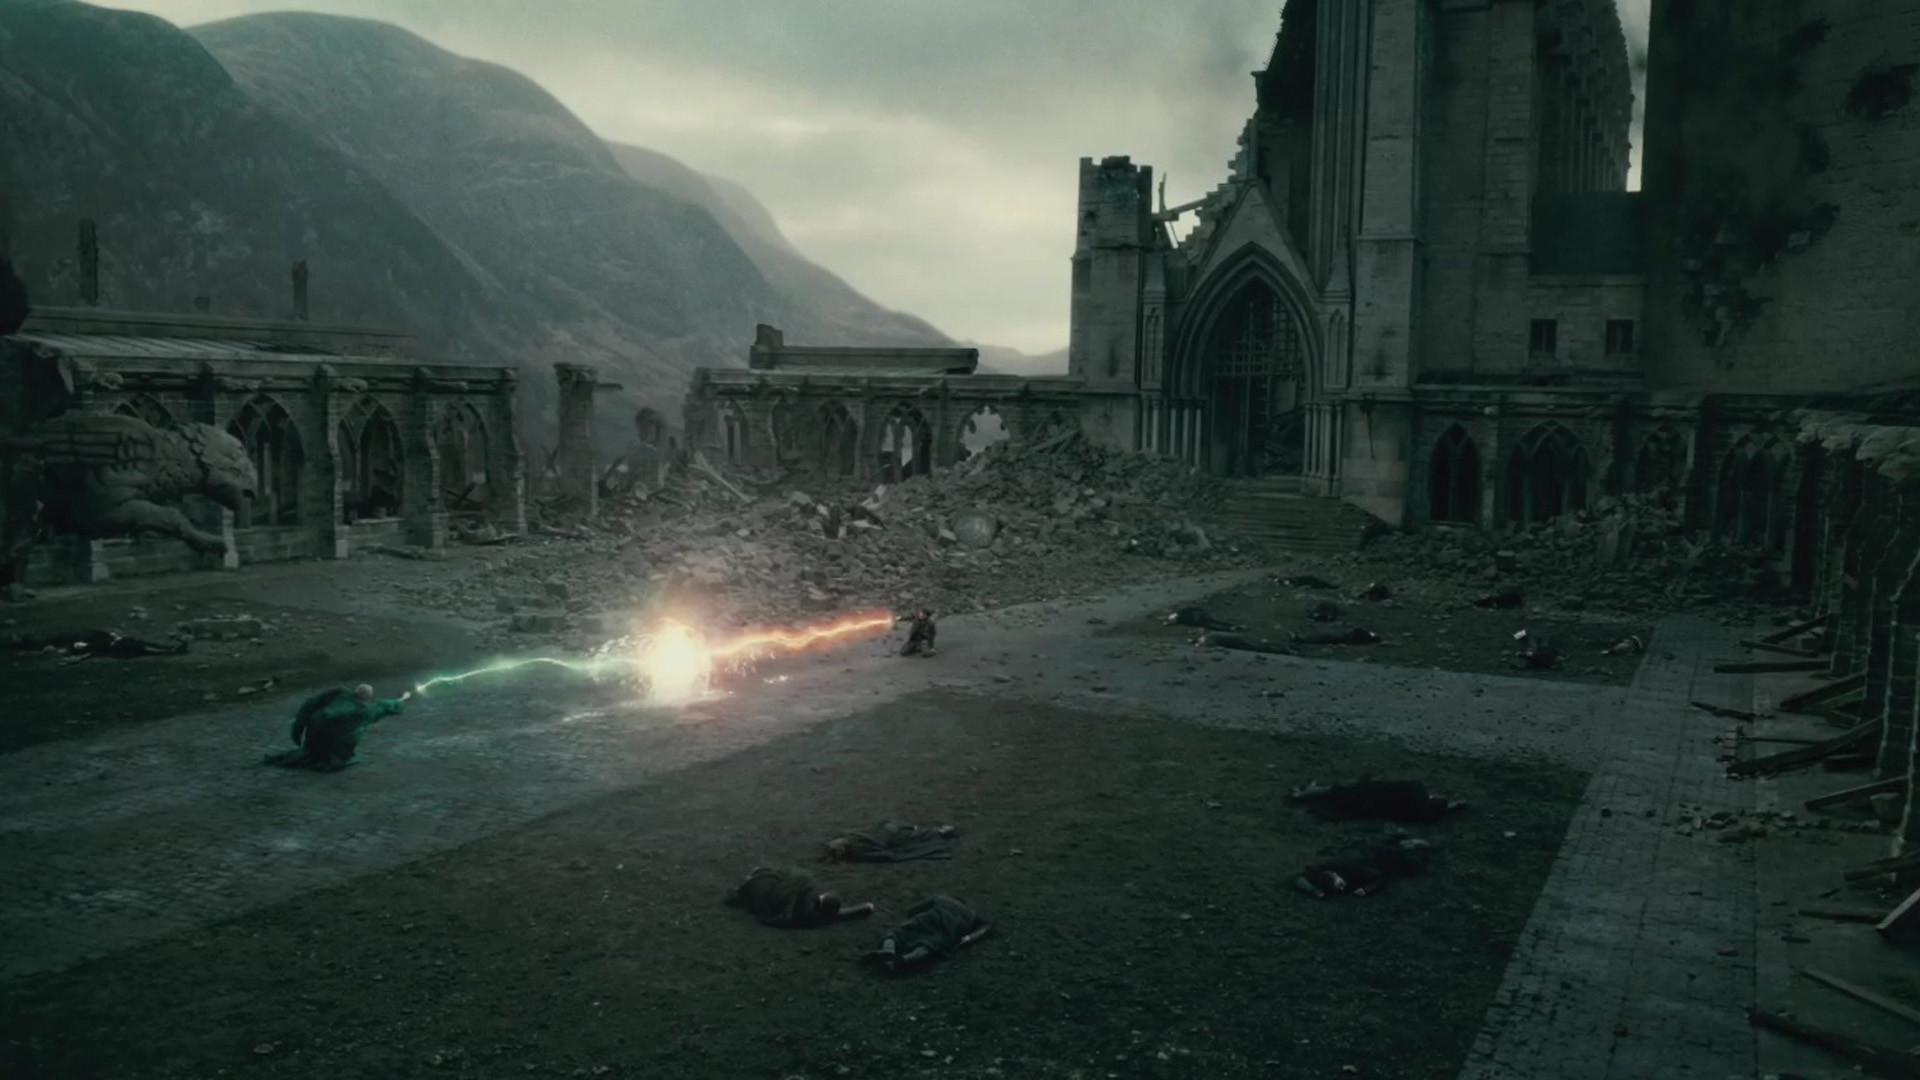 Harry Potter Wallpapers Hd: Hogwarts Wallpaper HD (64+ Images